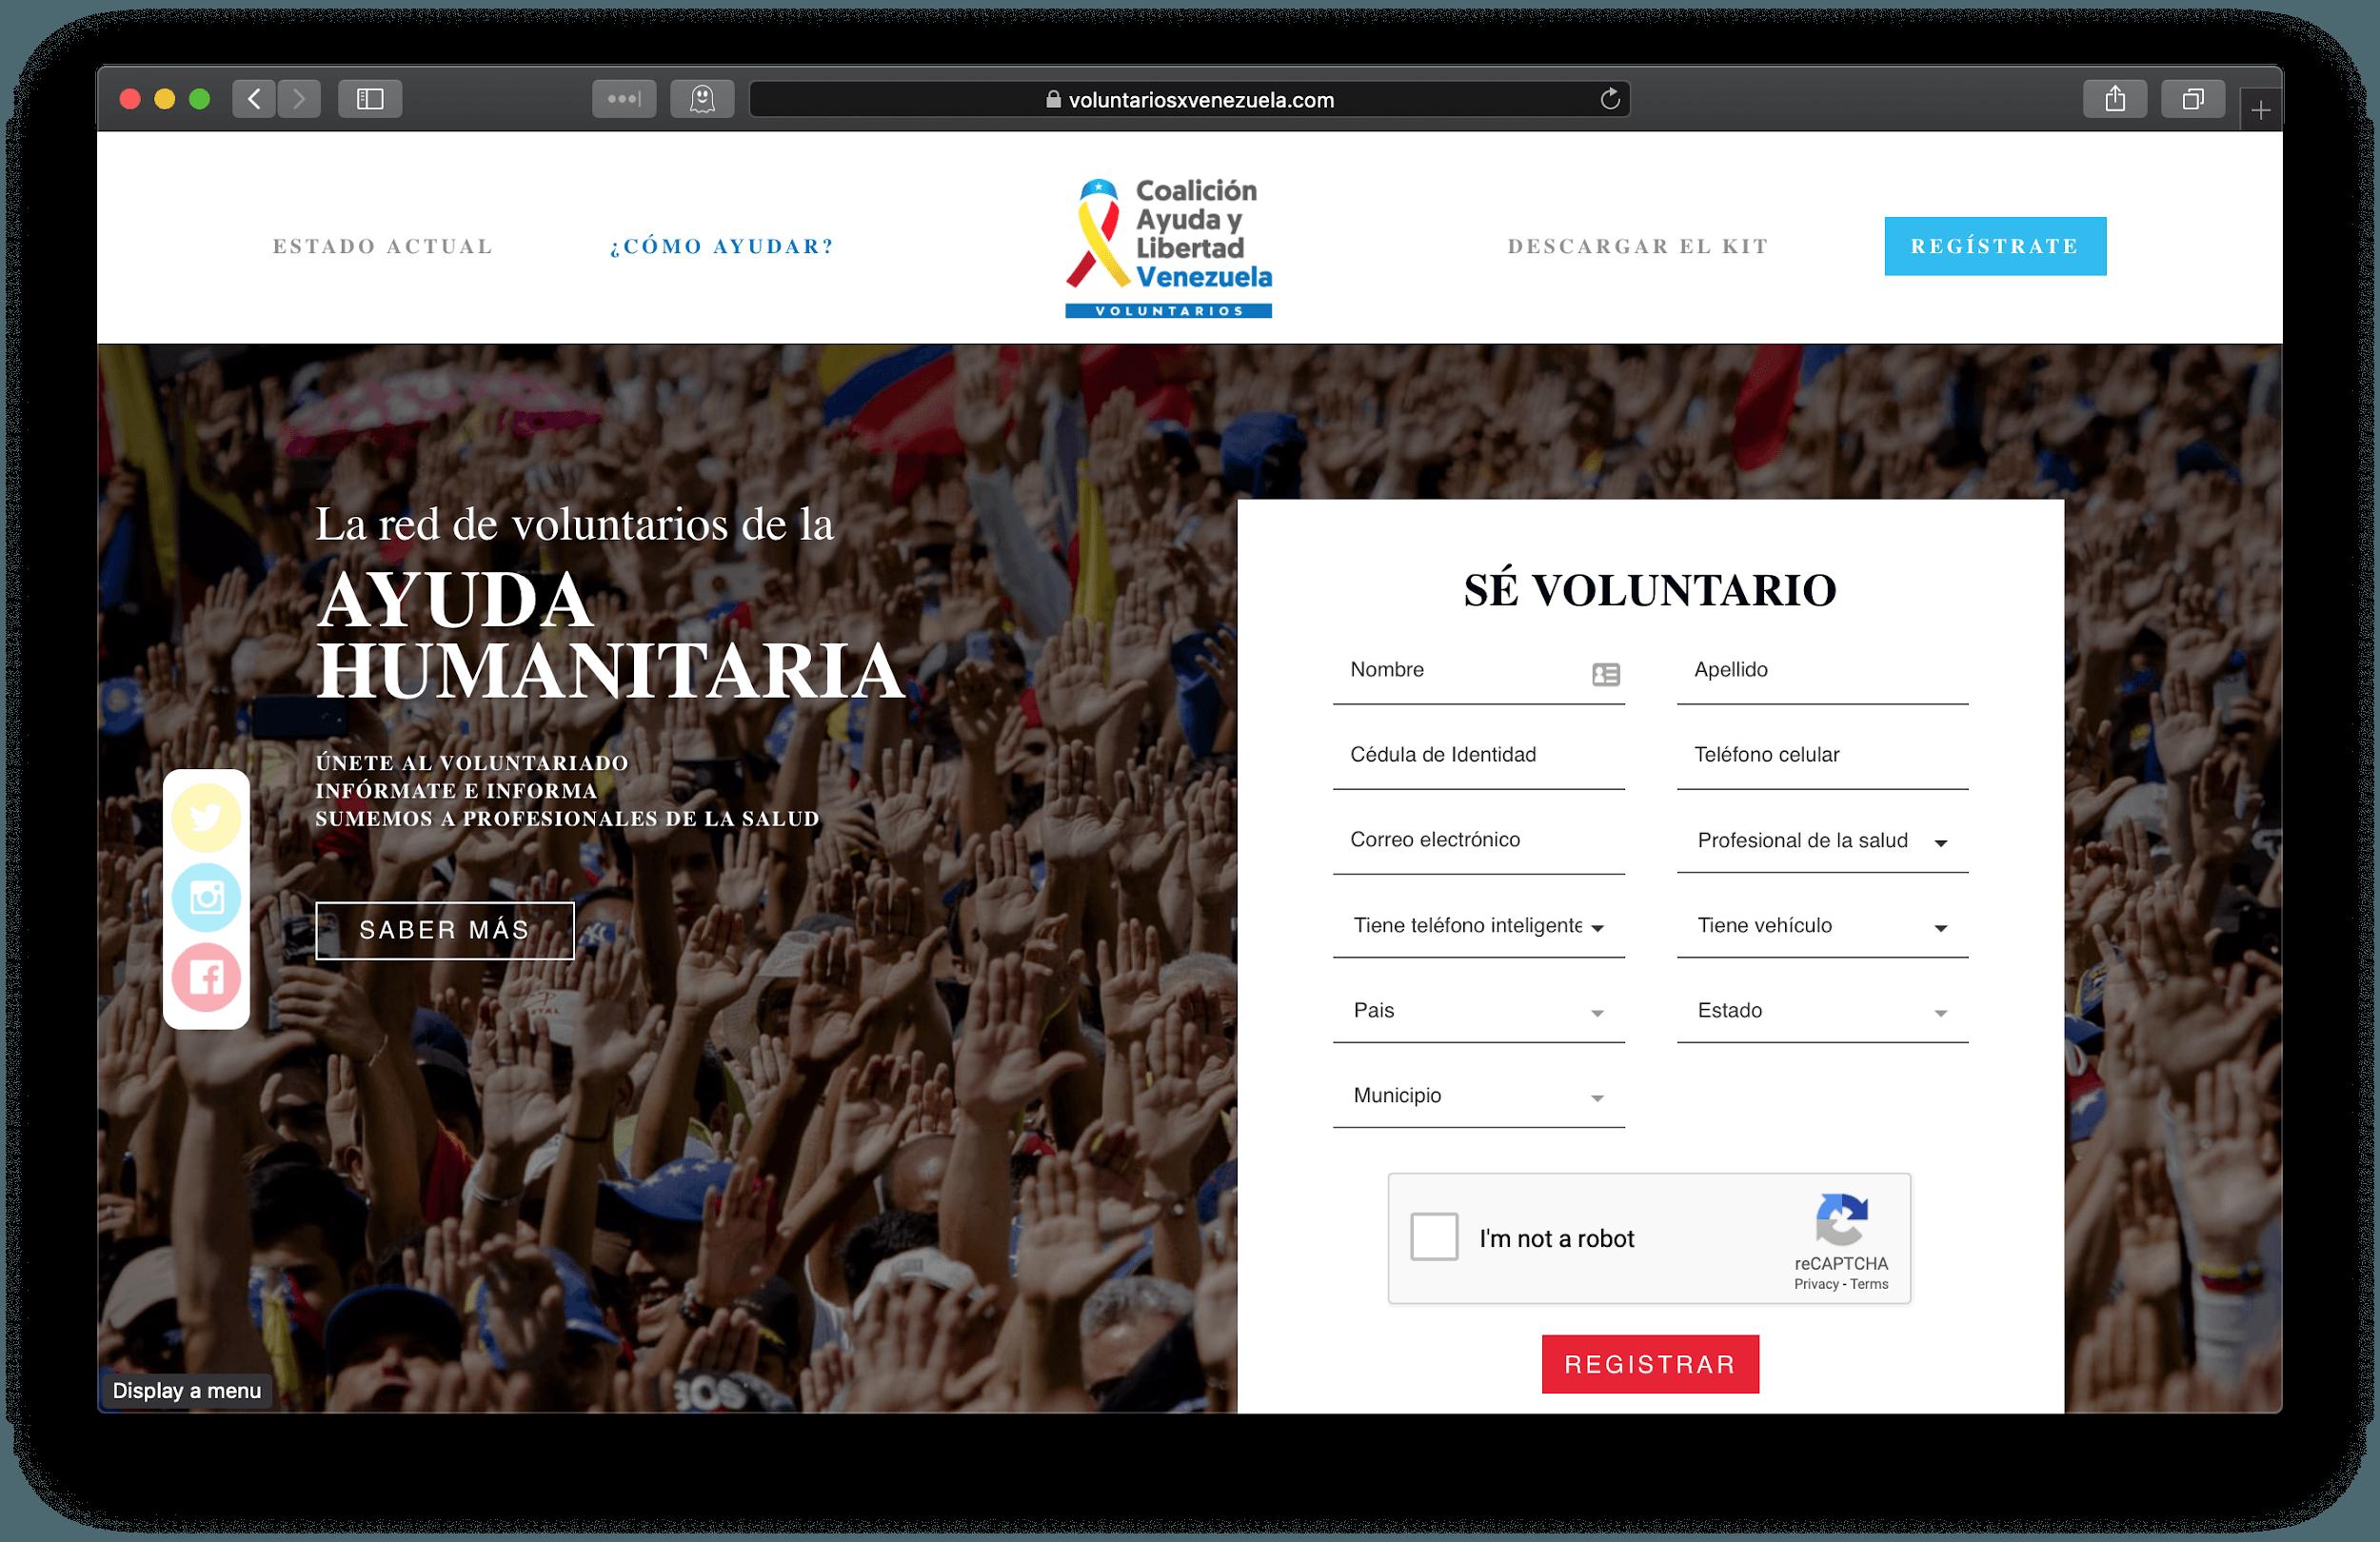 - 190213 dns venezuela 1 - DNS Manipulation in Venezuela in regards to the Humanitarian Aid Campaign